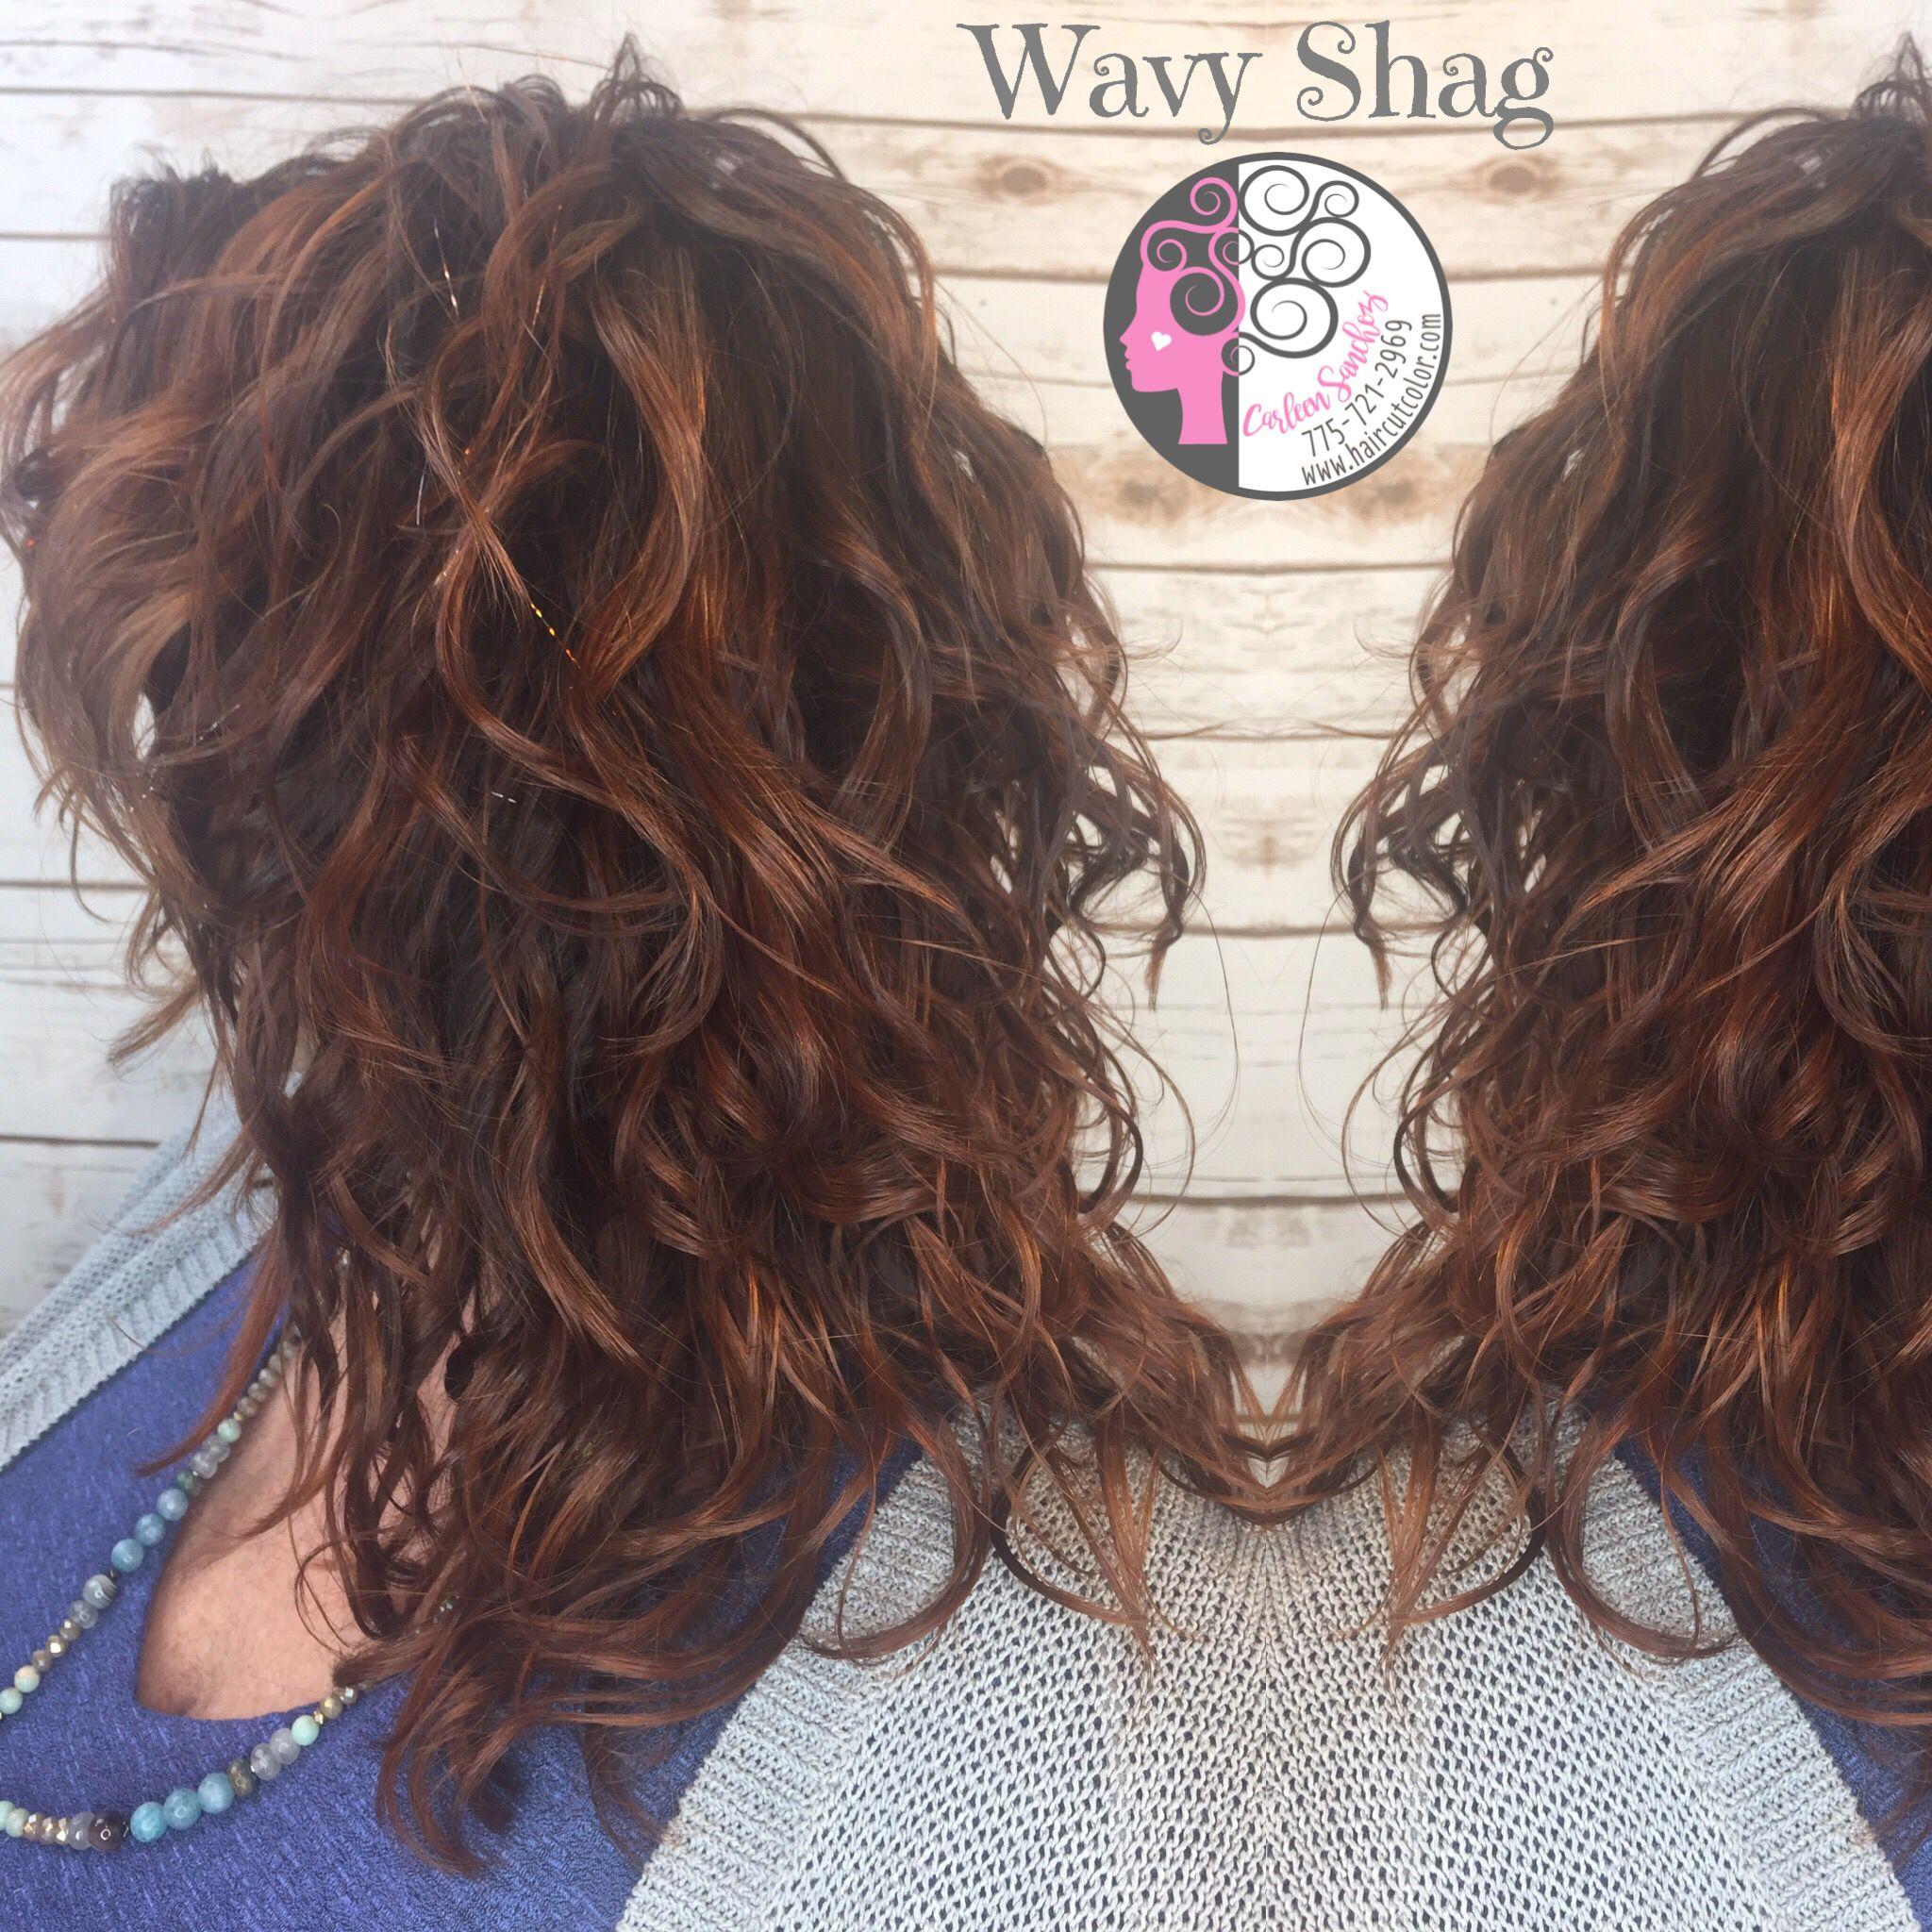 Naturally Curly Wavy Red Balayage Highlights Auburn Fall Hair By Carleen Sanchez Nevada S Curl Anti Agi Auburn Balayage Balayage Hair Red Balayage Highlights